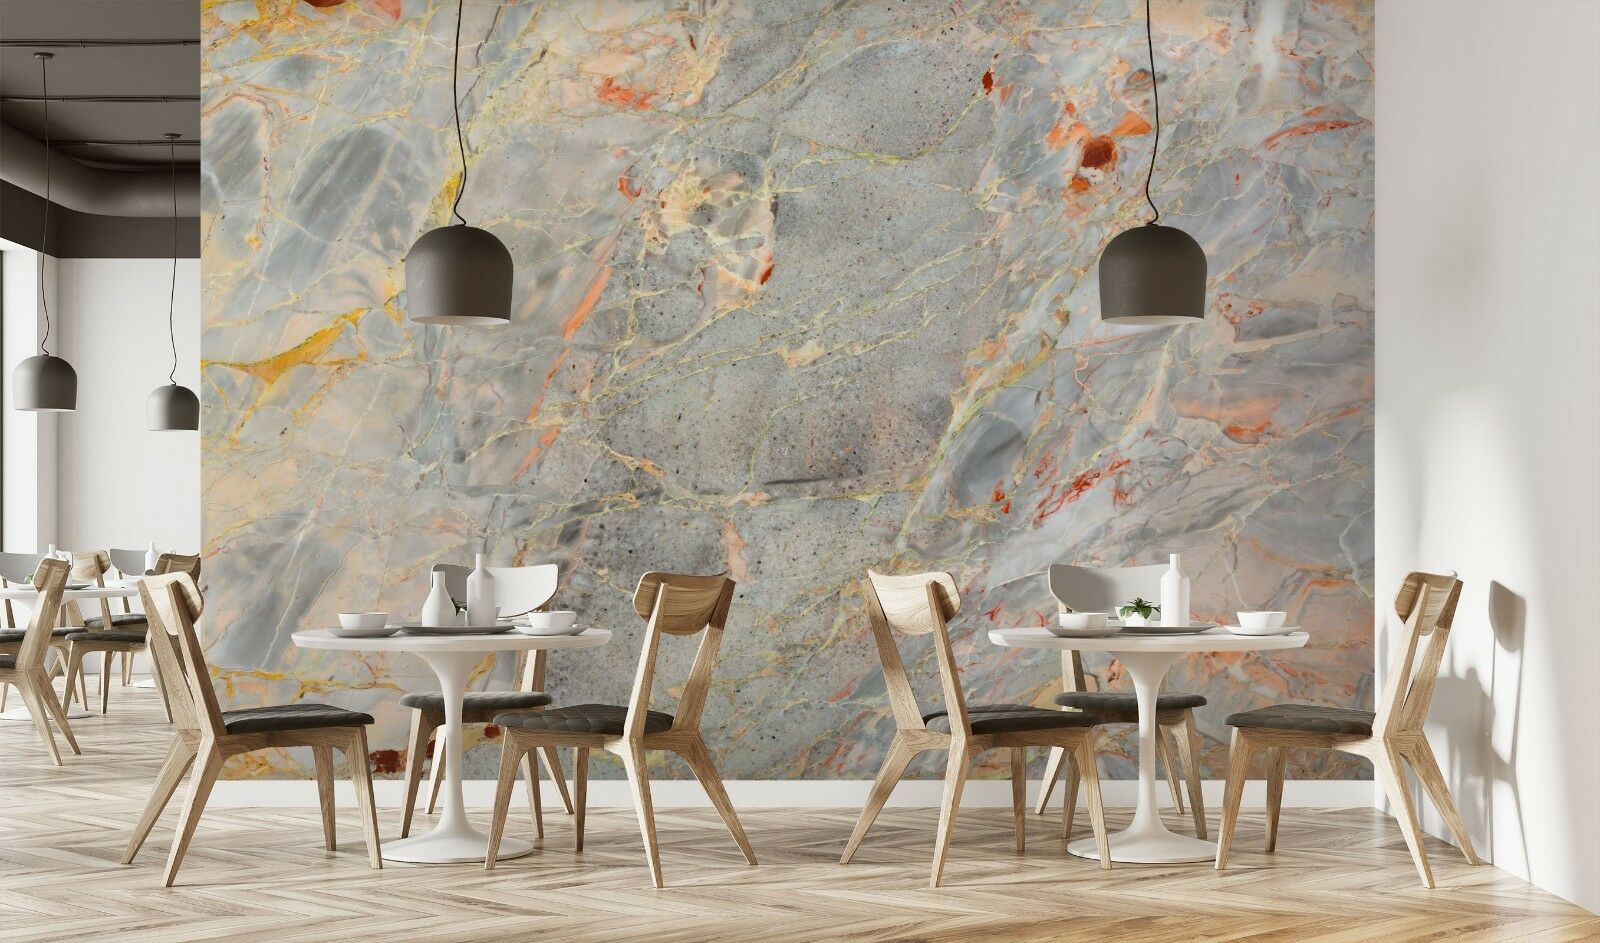 3D Hot Modern Marble 3 Texture Tiles Marble Wall Paper Decal Wallpaper Mural AJ